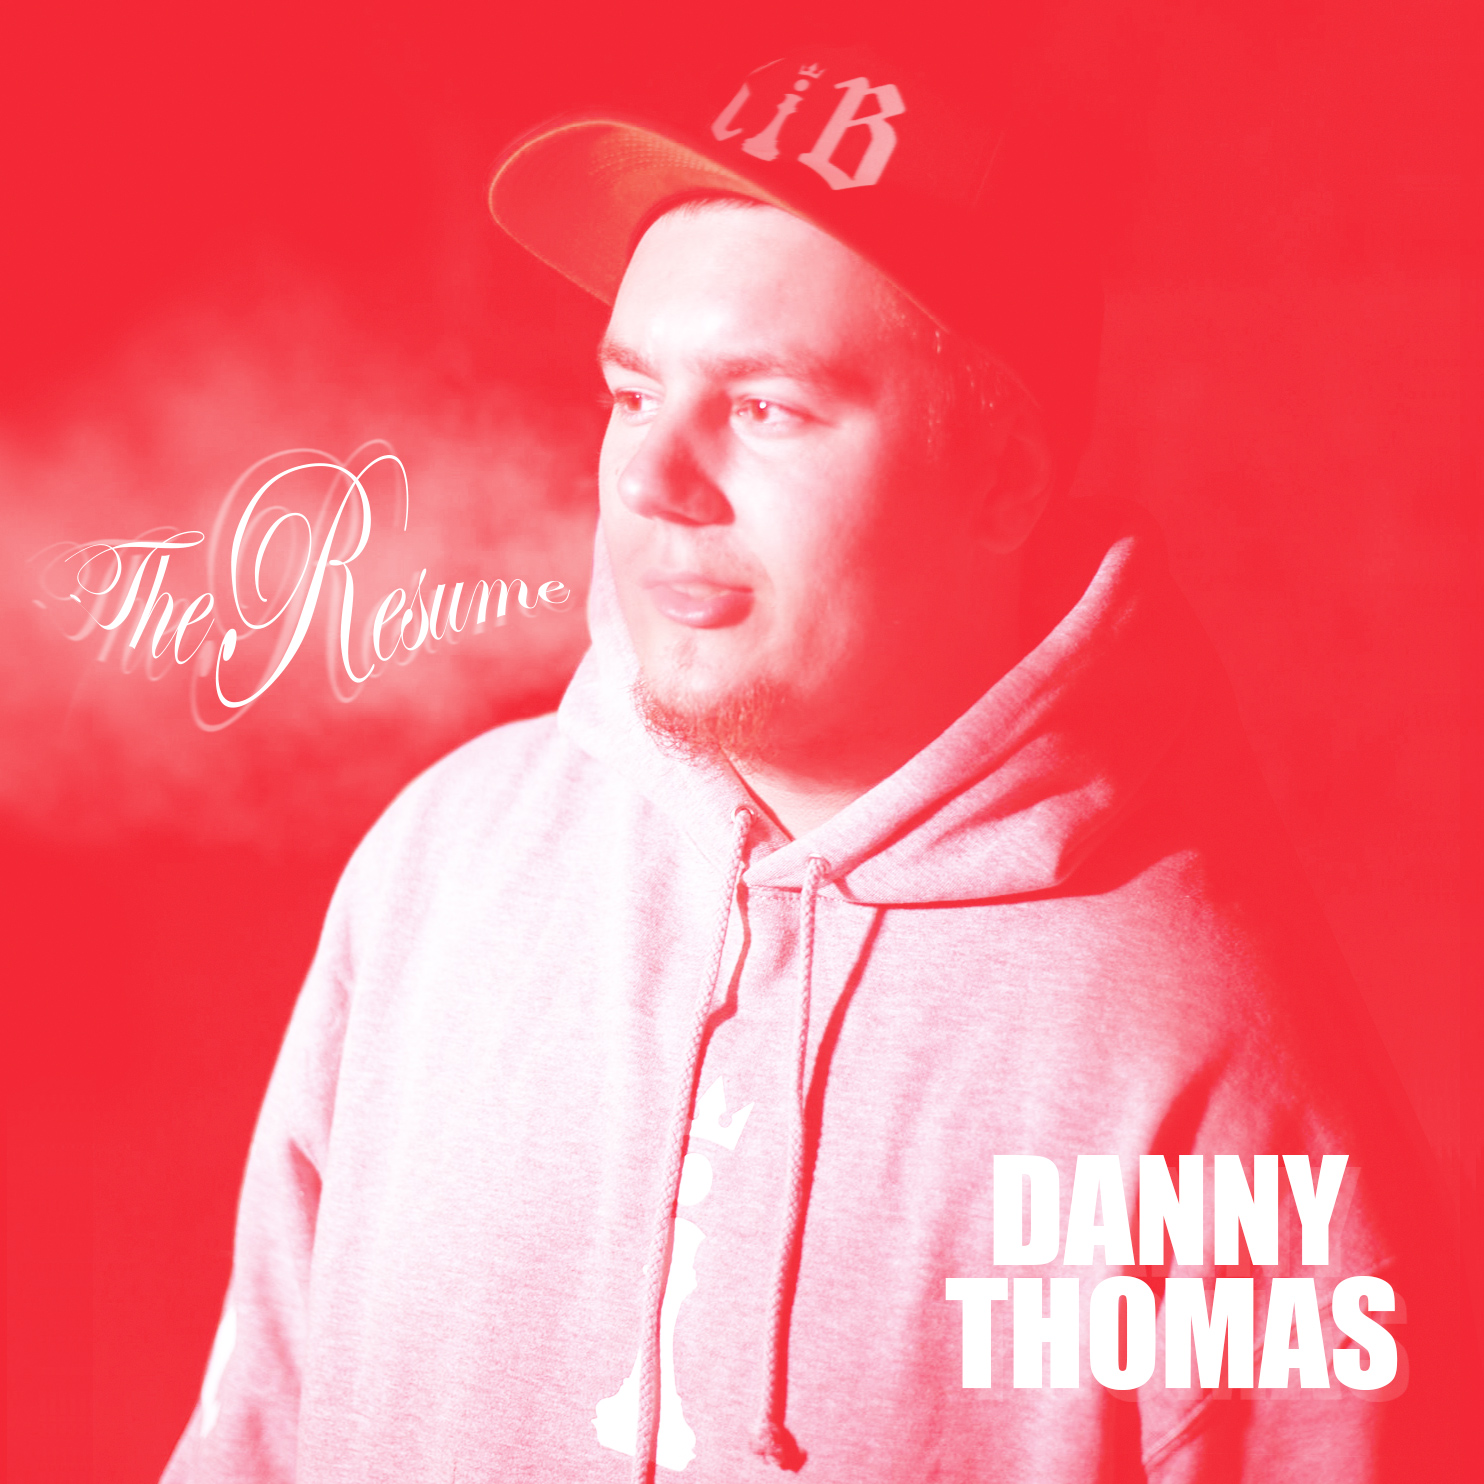 Danny-Thomas-The-Resume_part-2.jpg